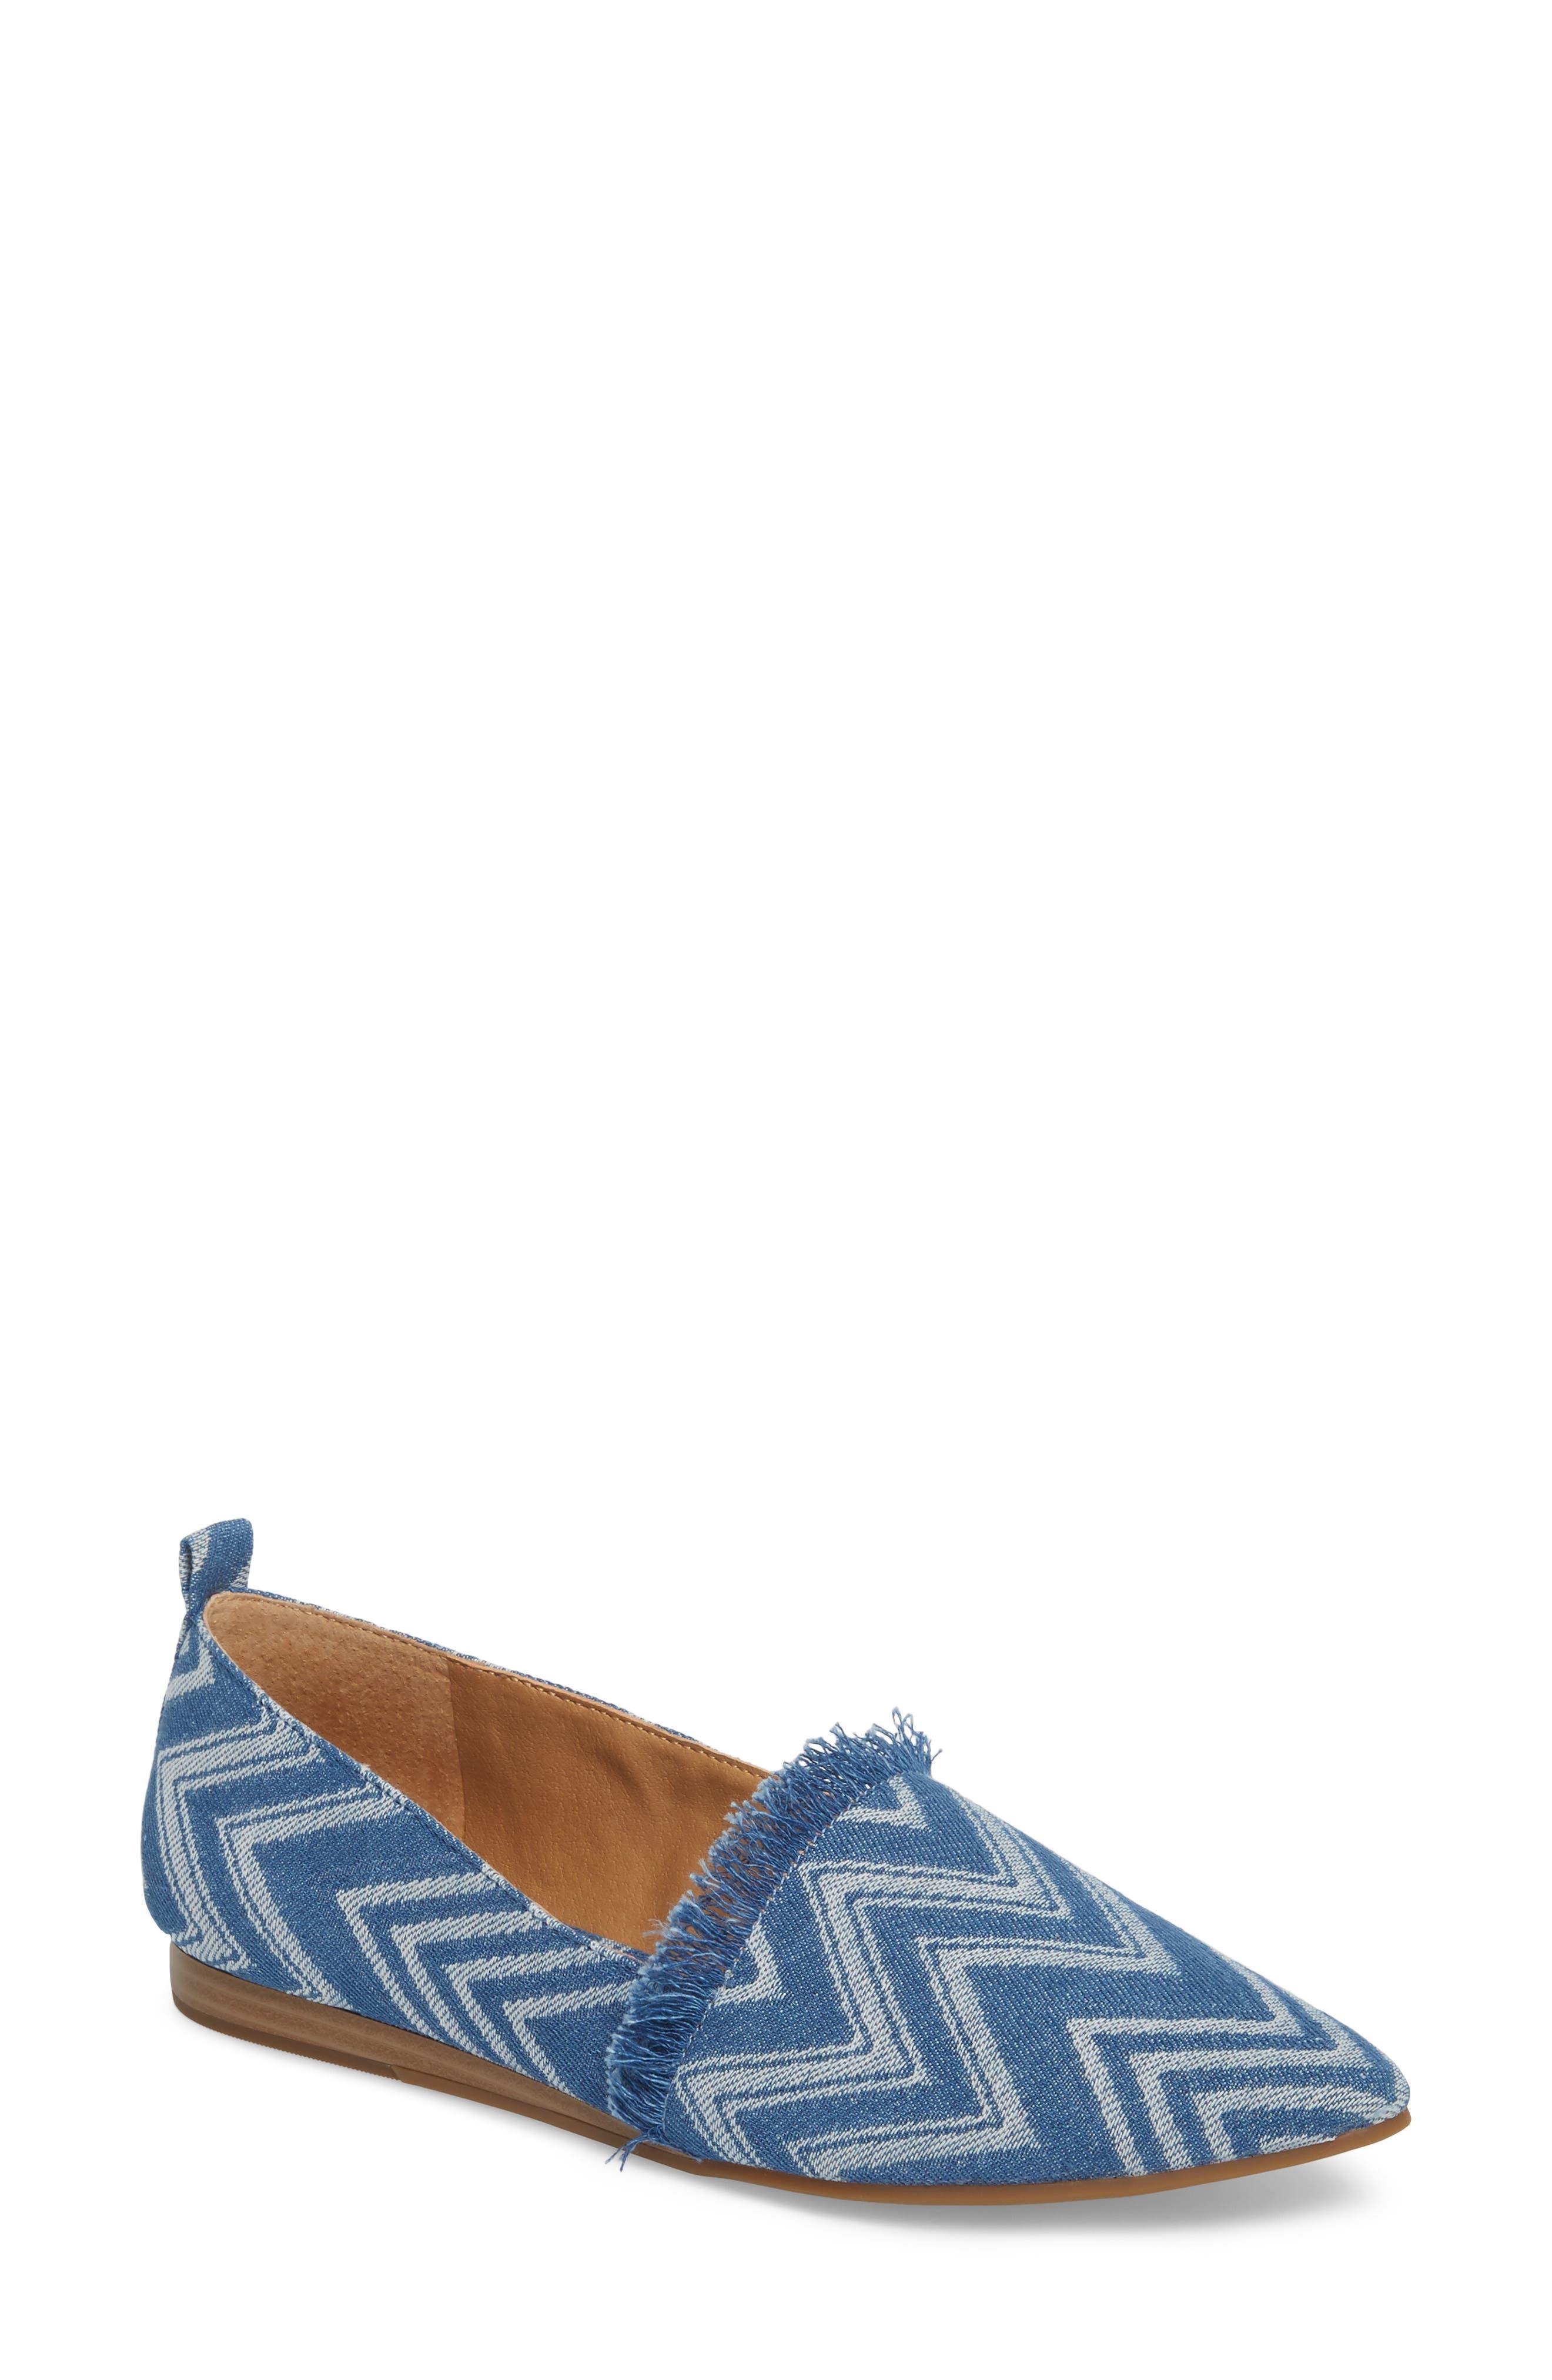 Alternate Image 1 Selected - Lucky Brand Beechmer Pointy Toe Flat (Women)